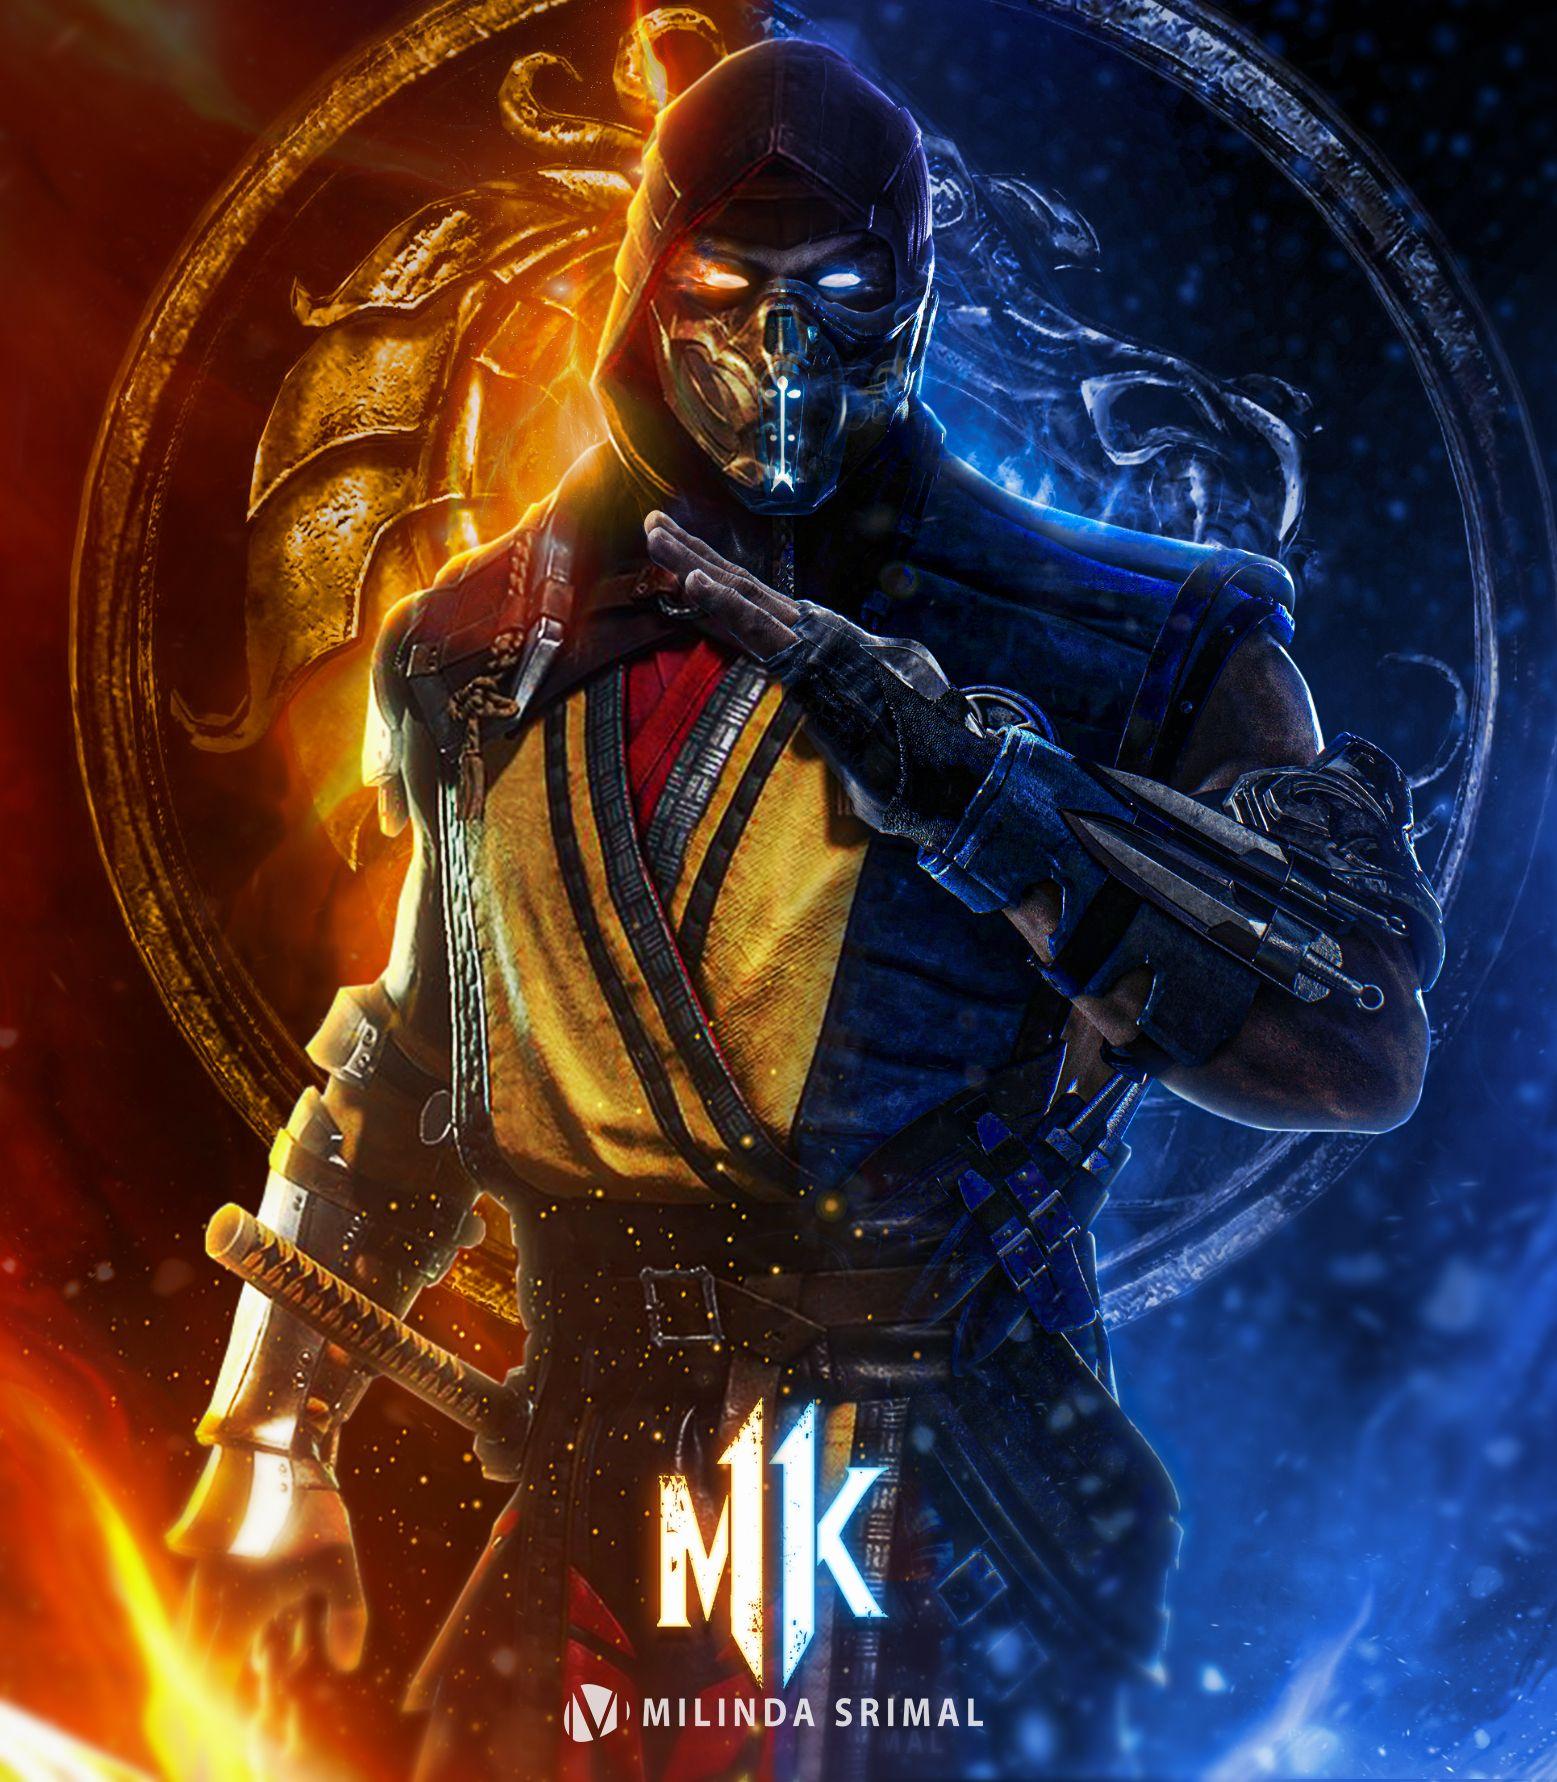 Mortal Kombat Movie Scorpion vs Sub Zero Mortal Kombat